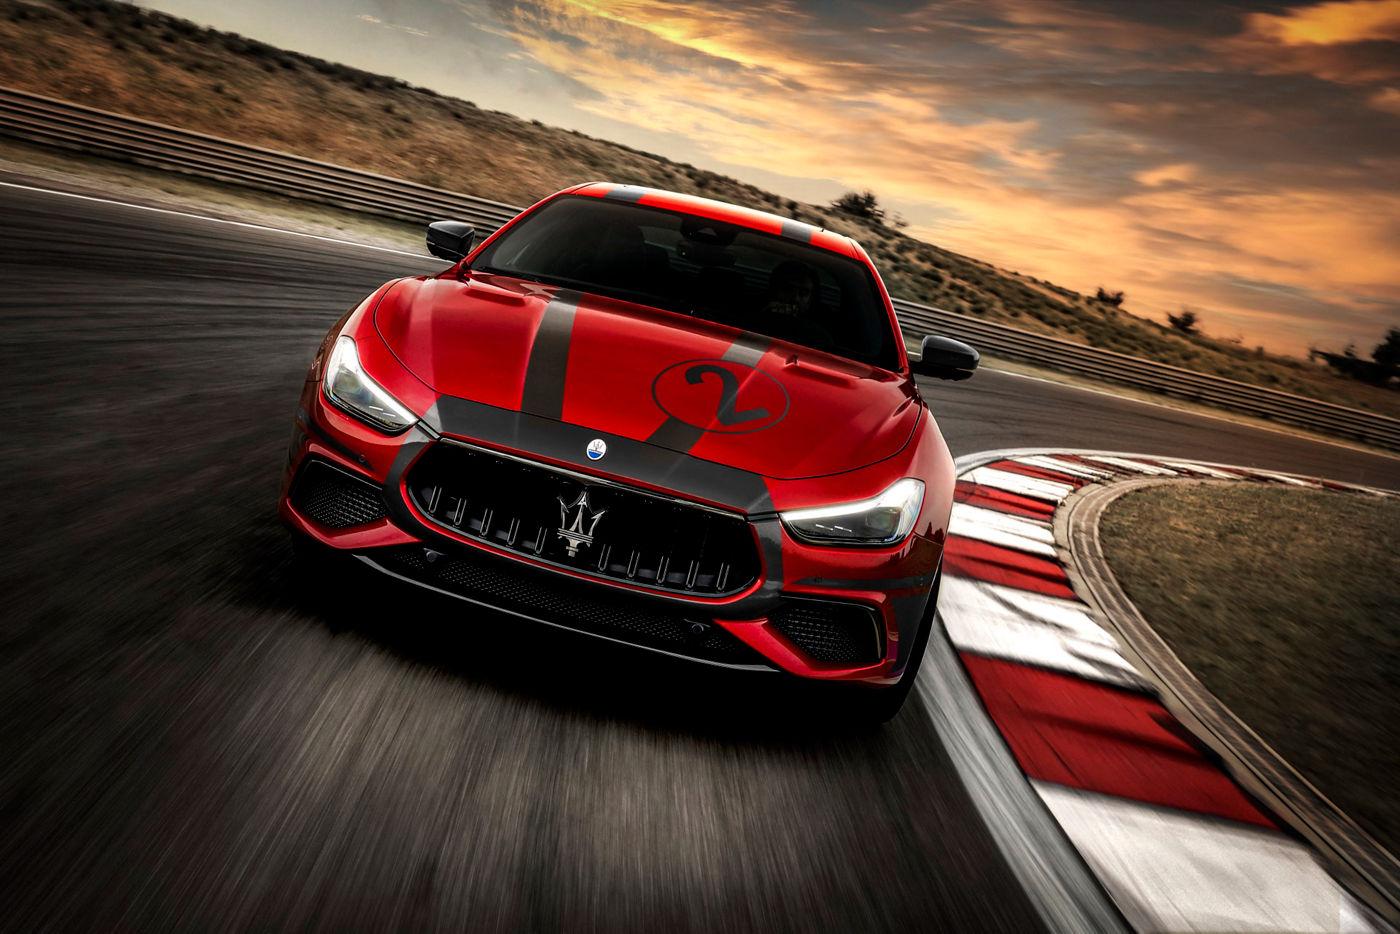 Master Maserati - Ghibli Trofeo auf der Rennstrecke im GT-Modus